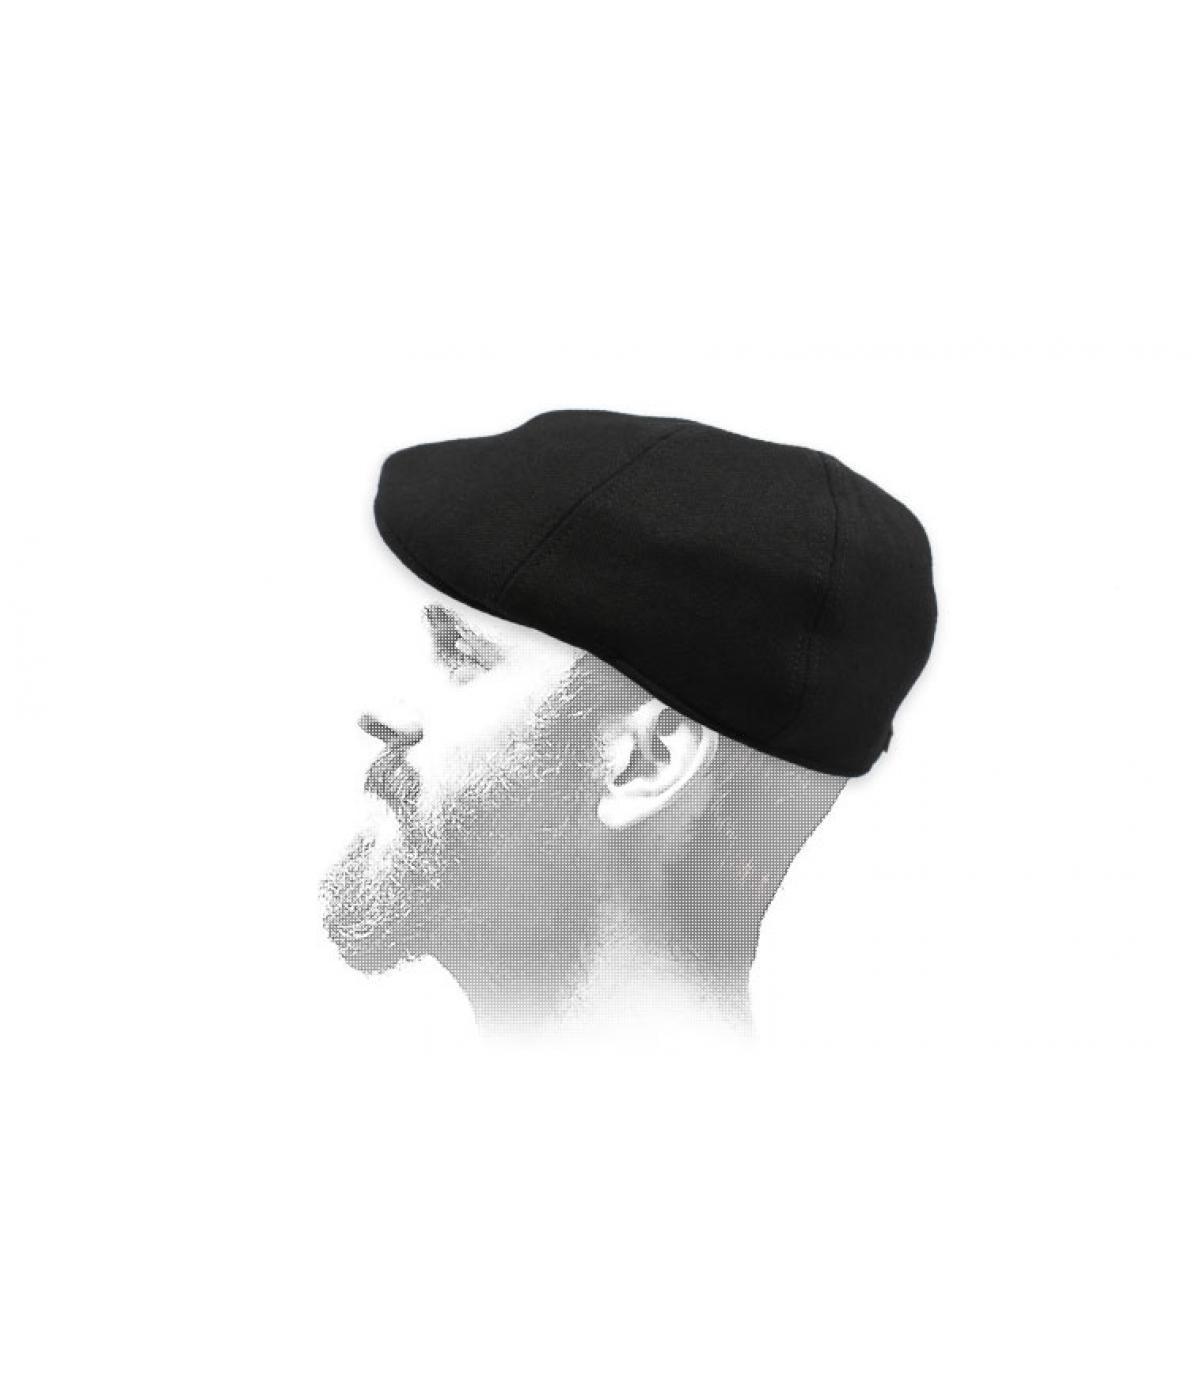 gorra duckbill negro lana